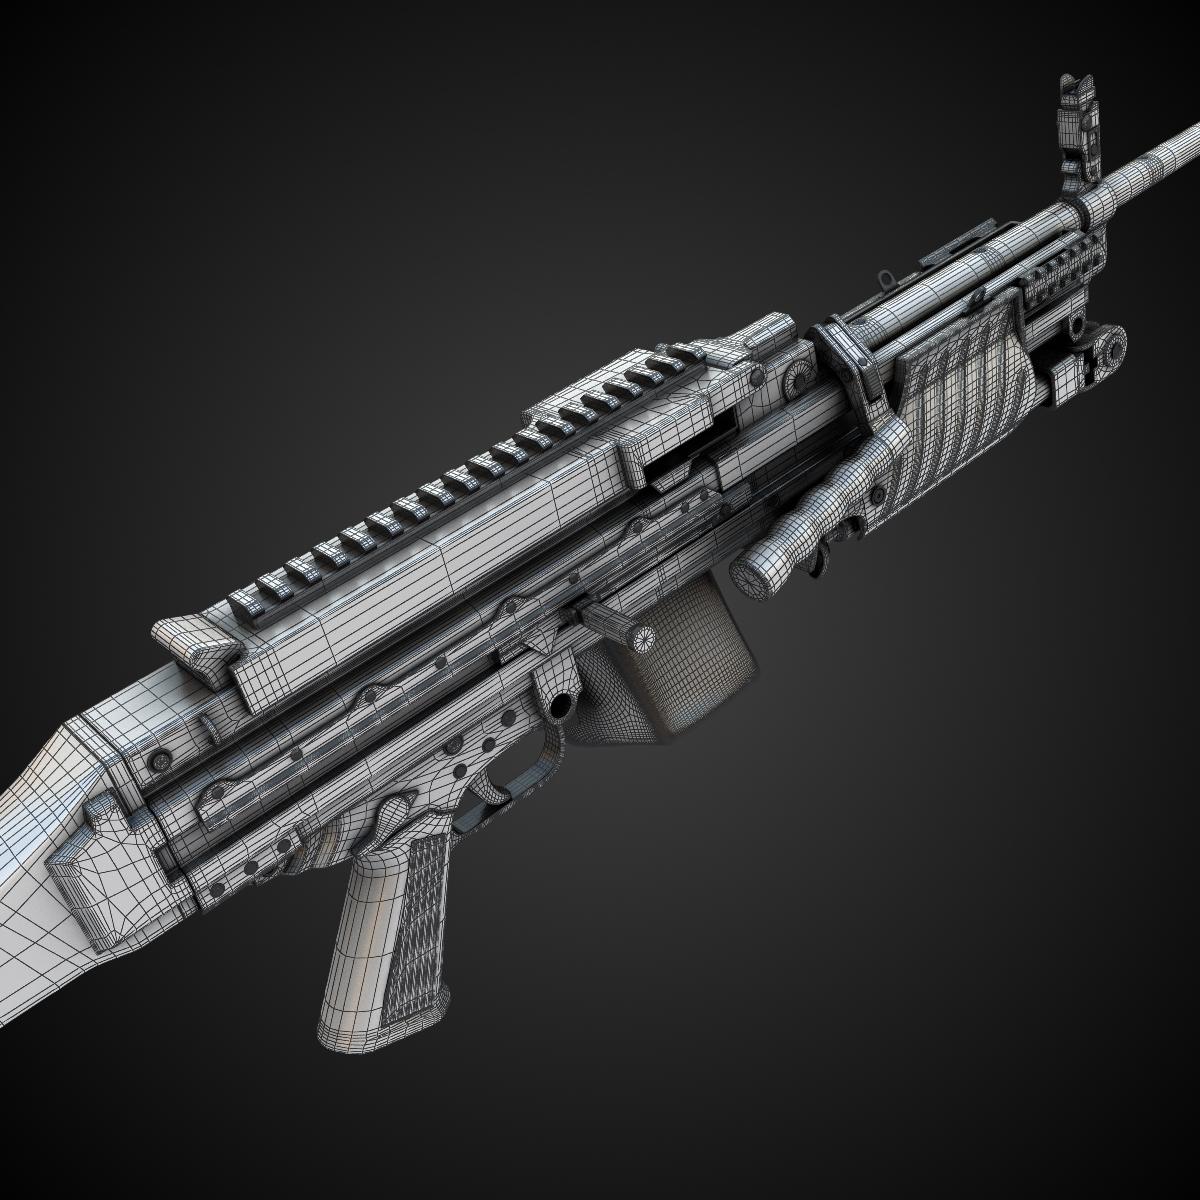 MG-4 machine gun